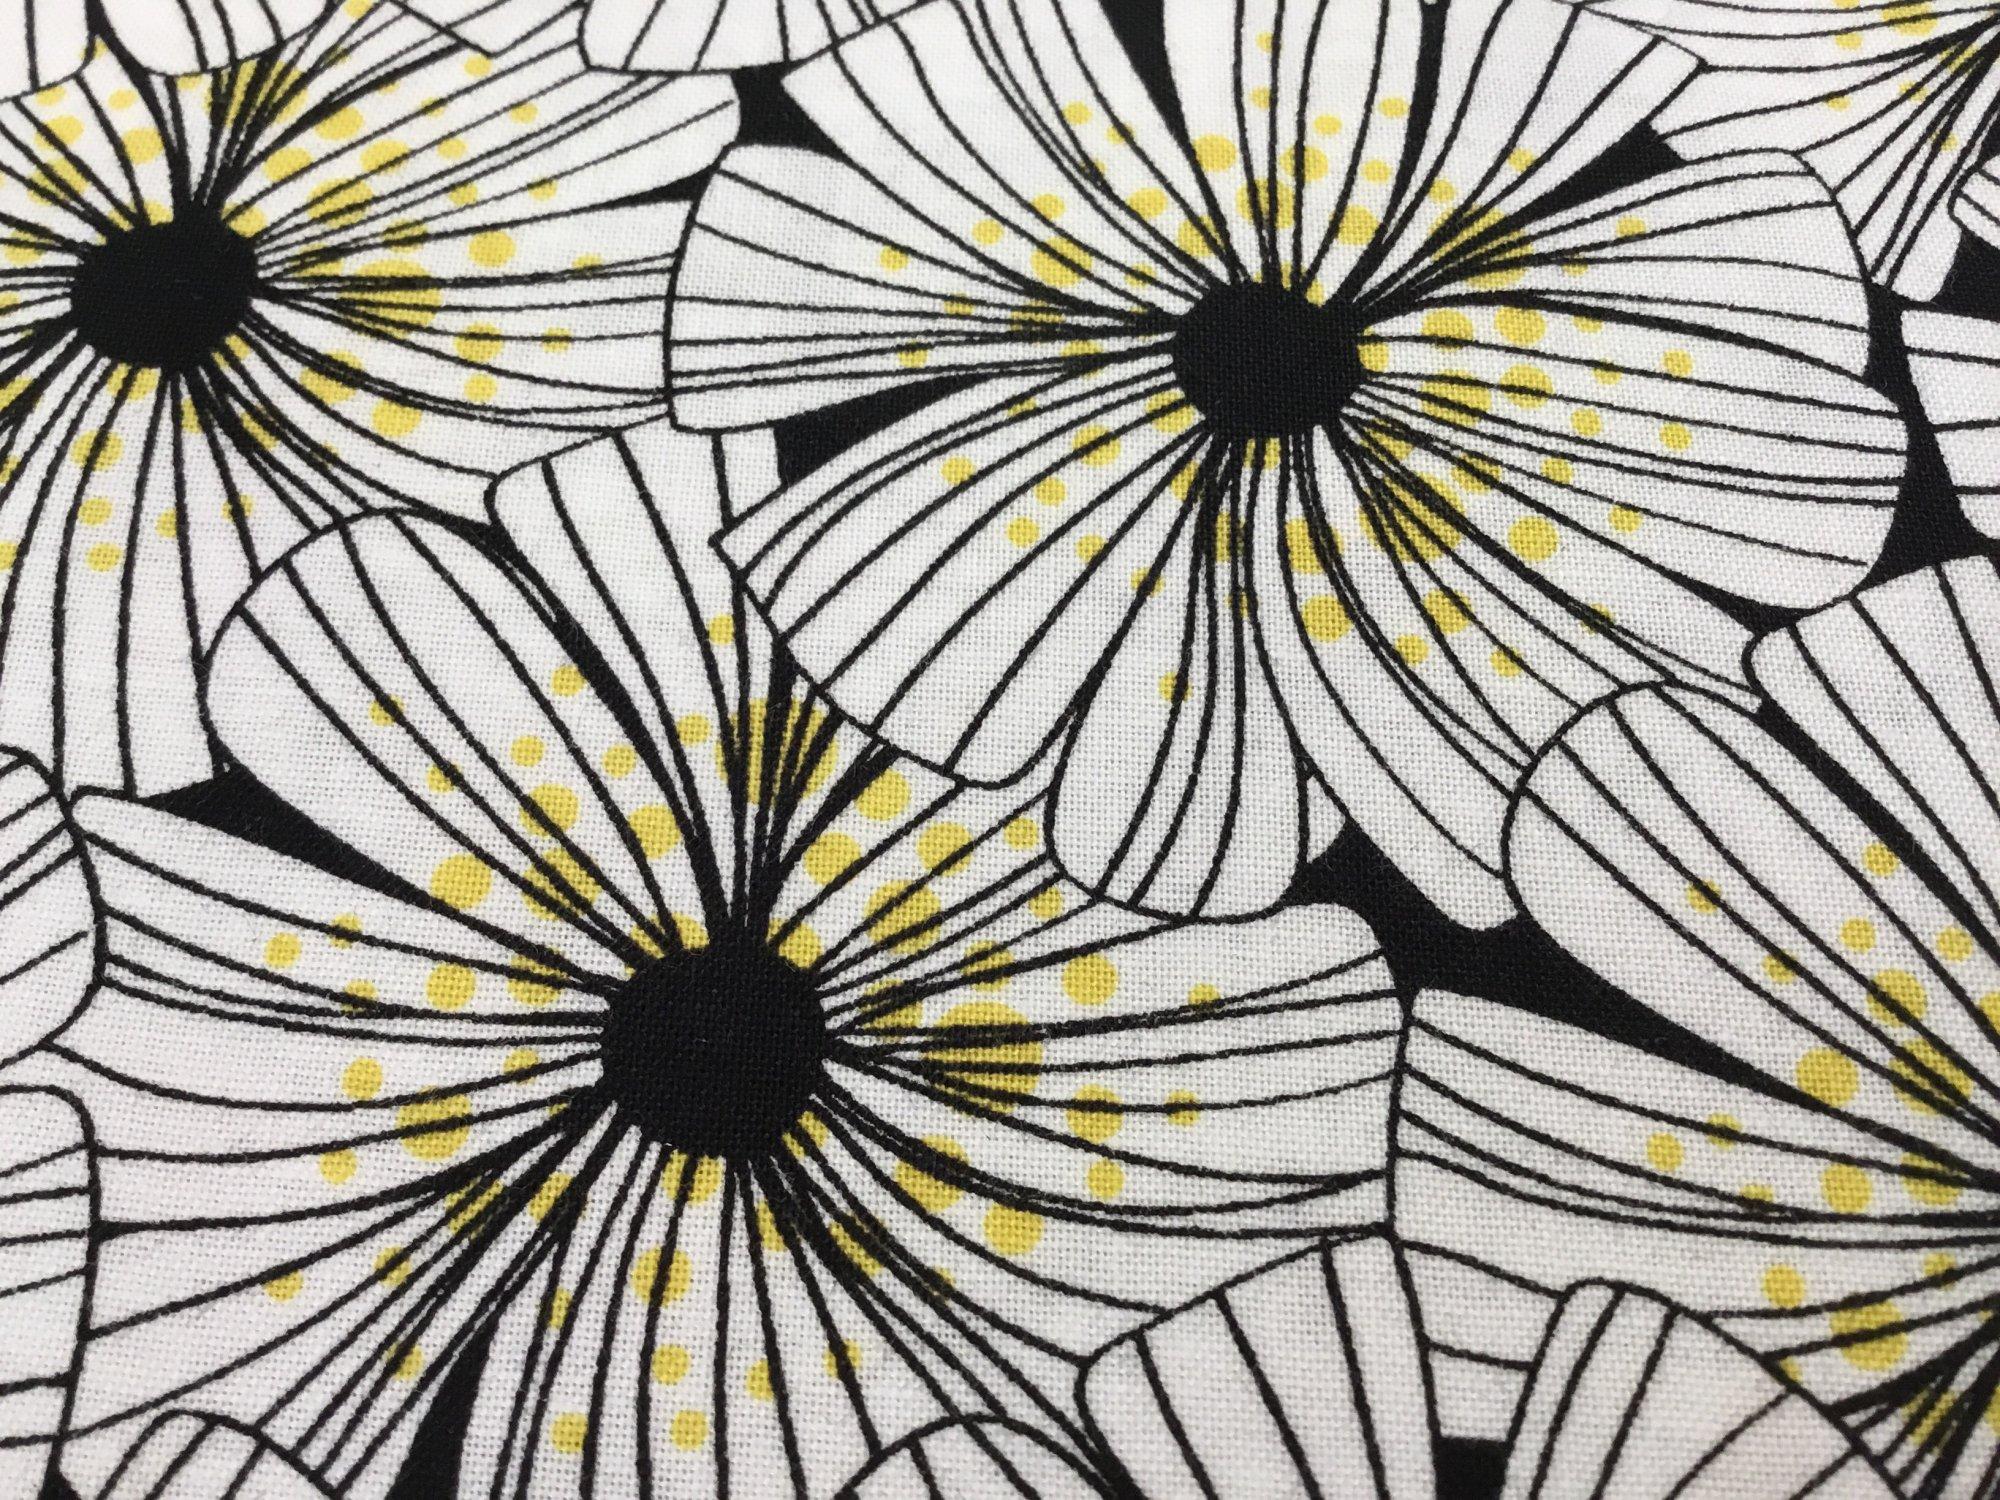 SUNNY DAYS FLORAL 70447915 Wilmington Prints